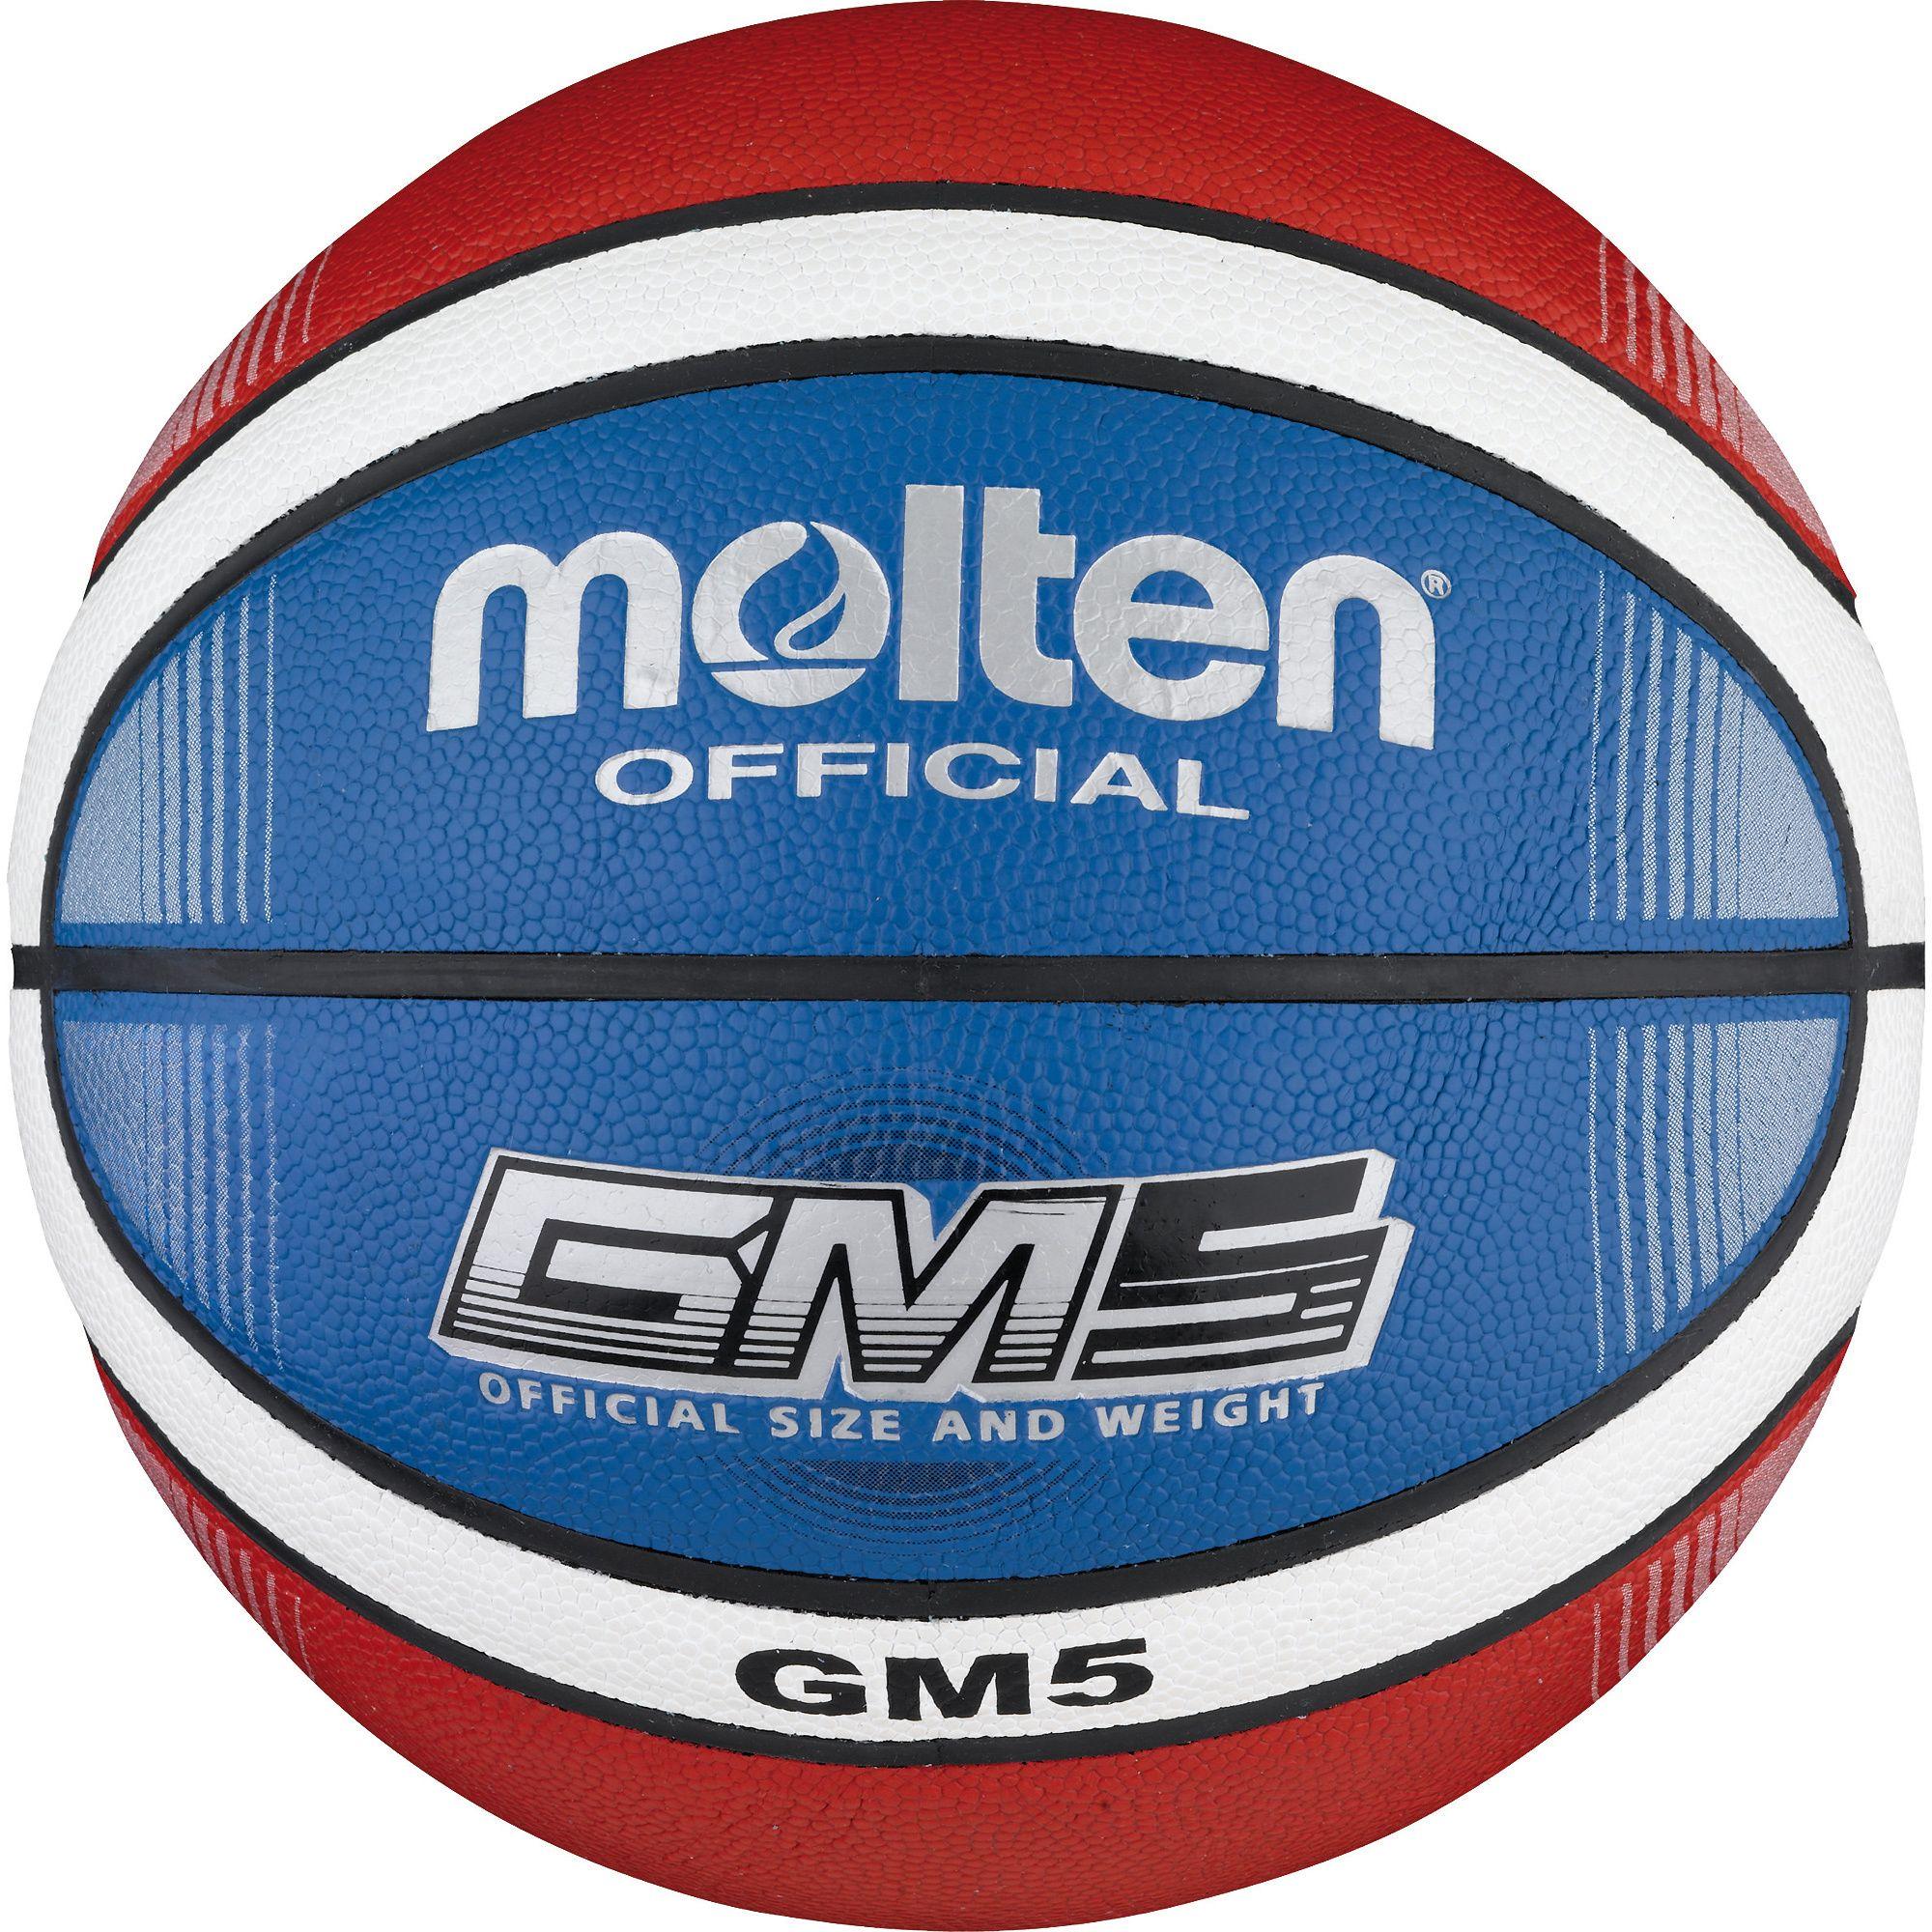 MOLTEN Molten BGM5X-C Basketball